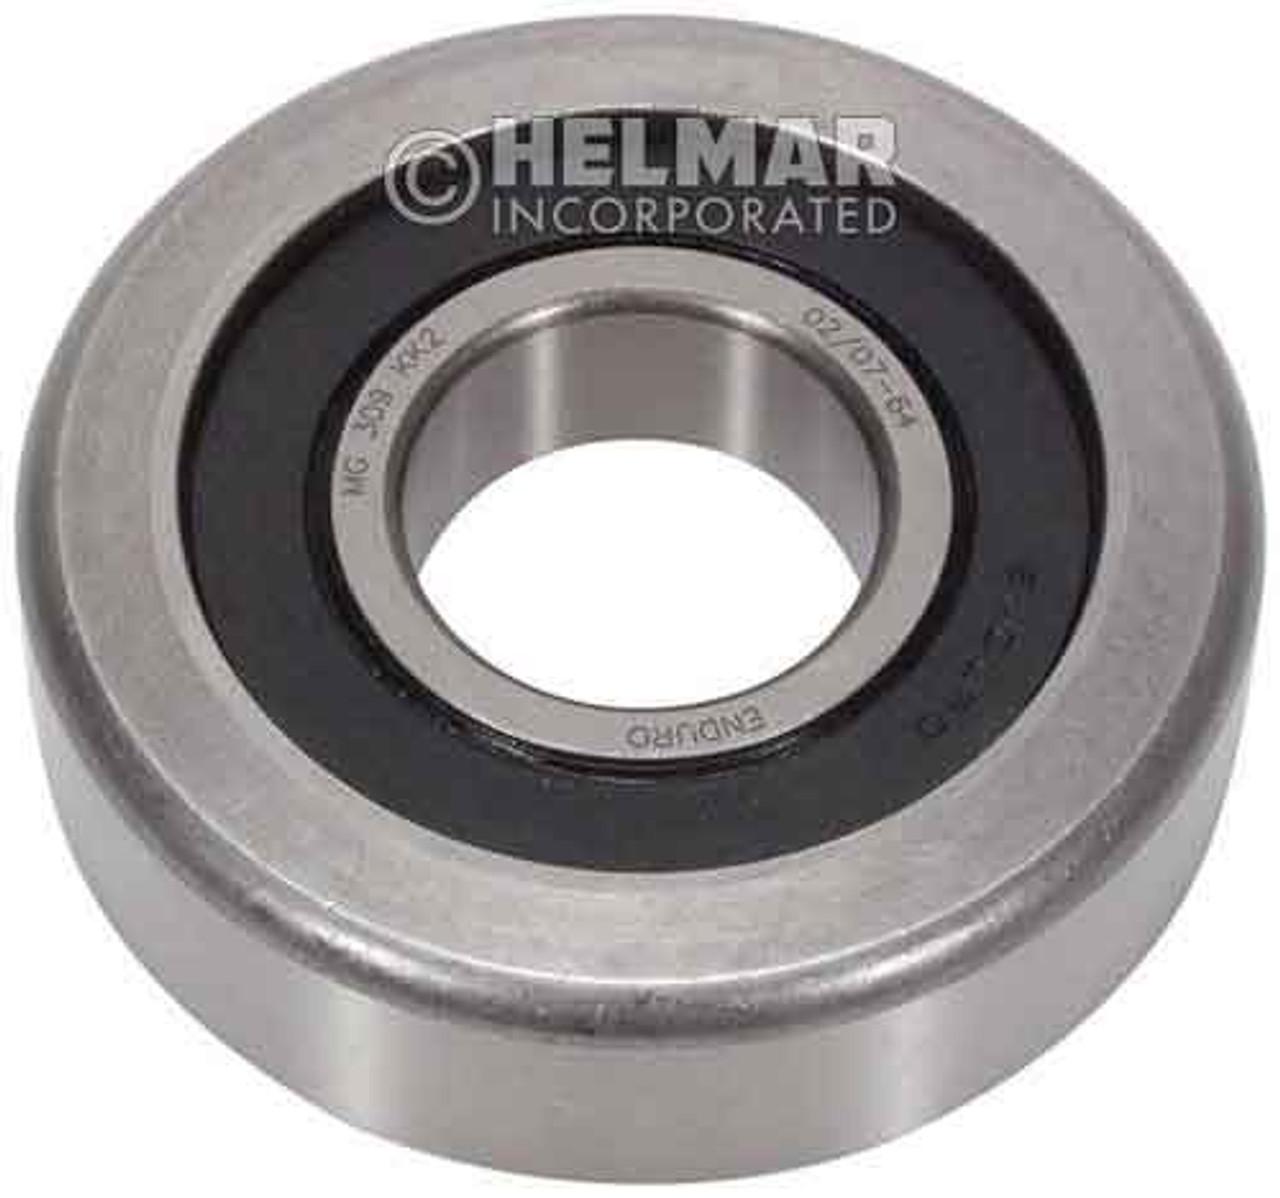 94447-11300 Mitsi/Cat Mast Roller Bearing 32.01mm Wide, 117.98mm Outer Diameter, 44.37mm Inner Diameter